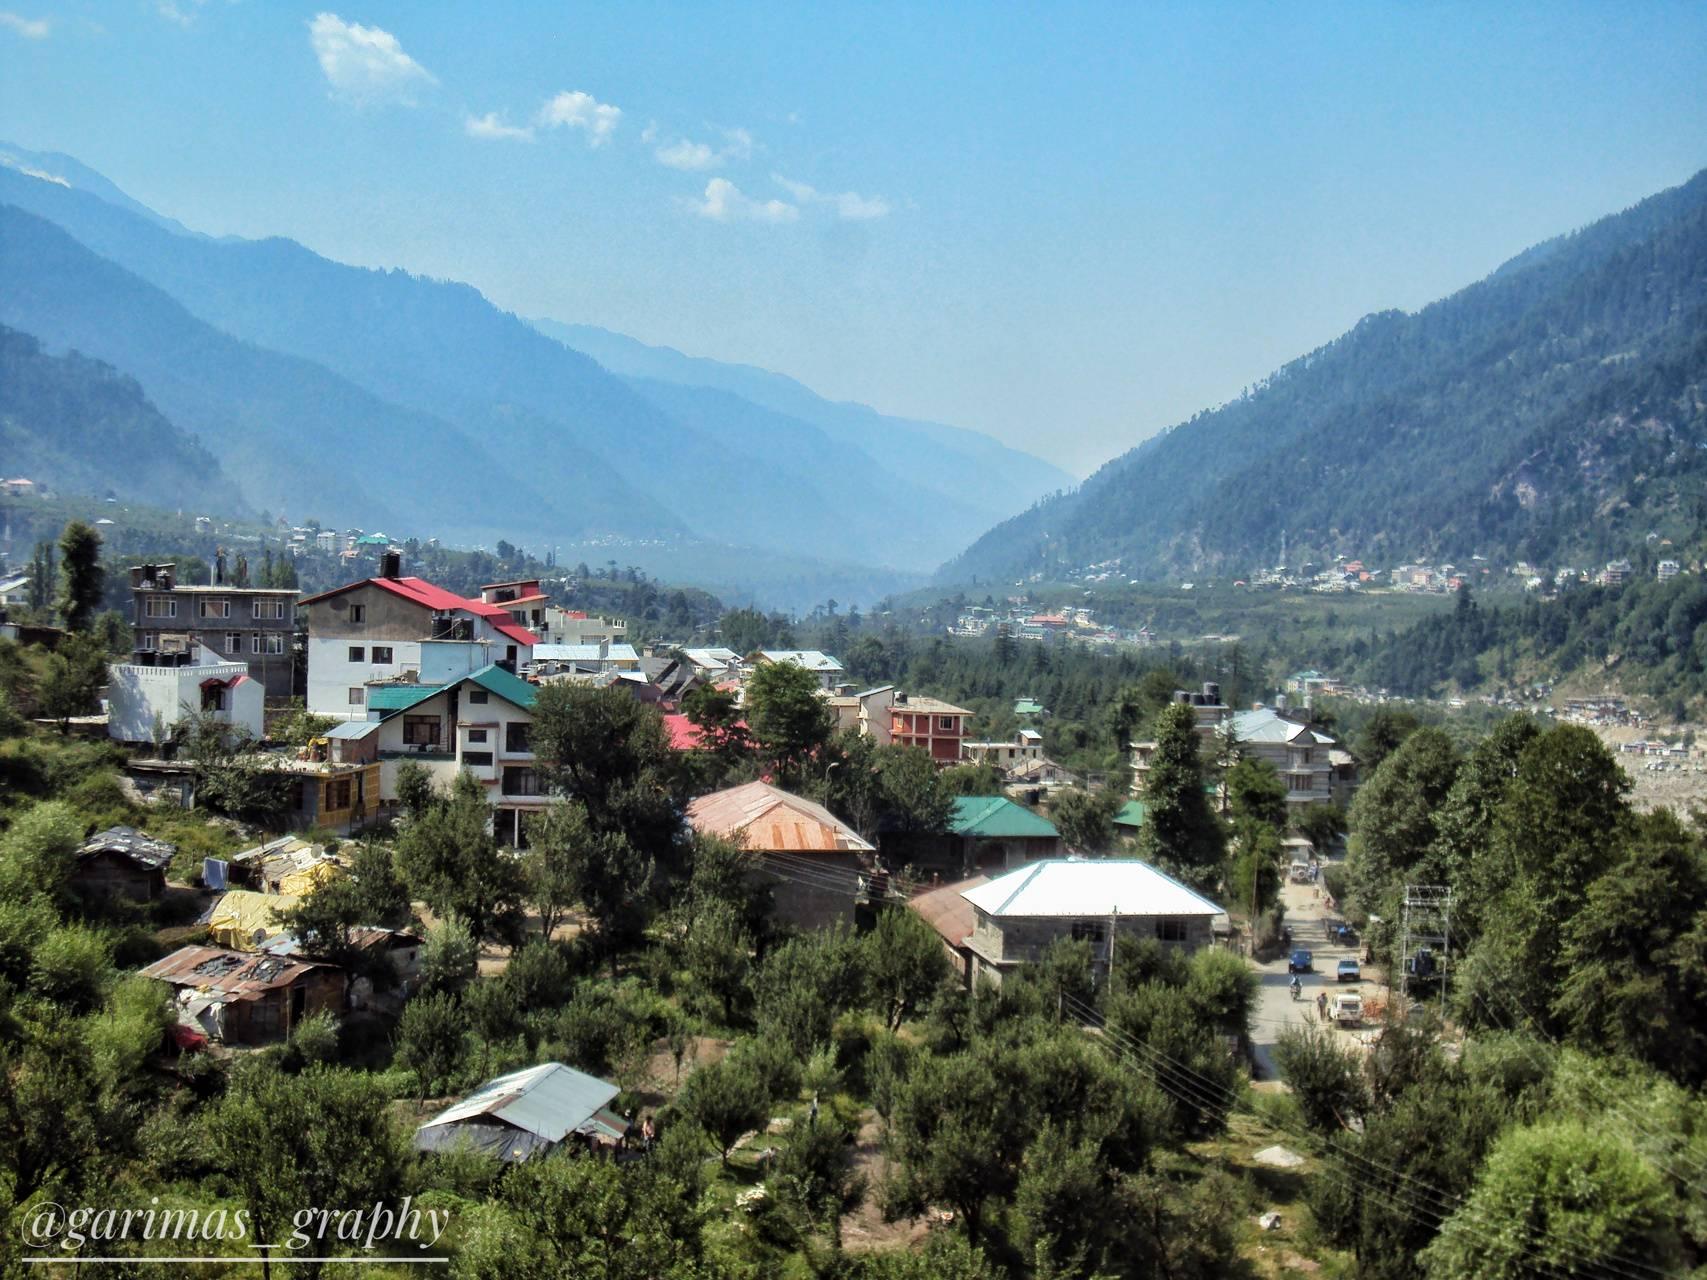 Manali view capture